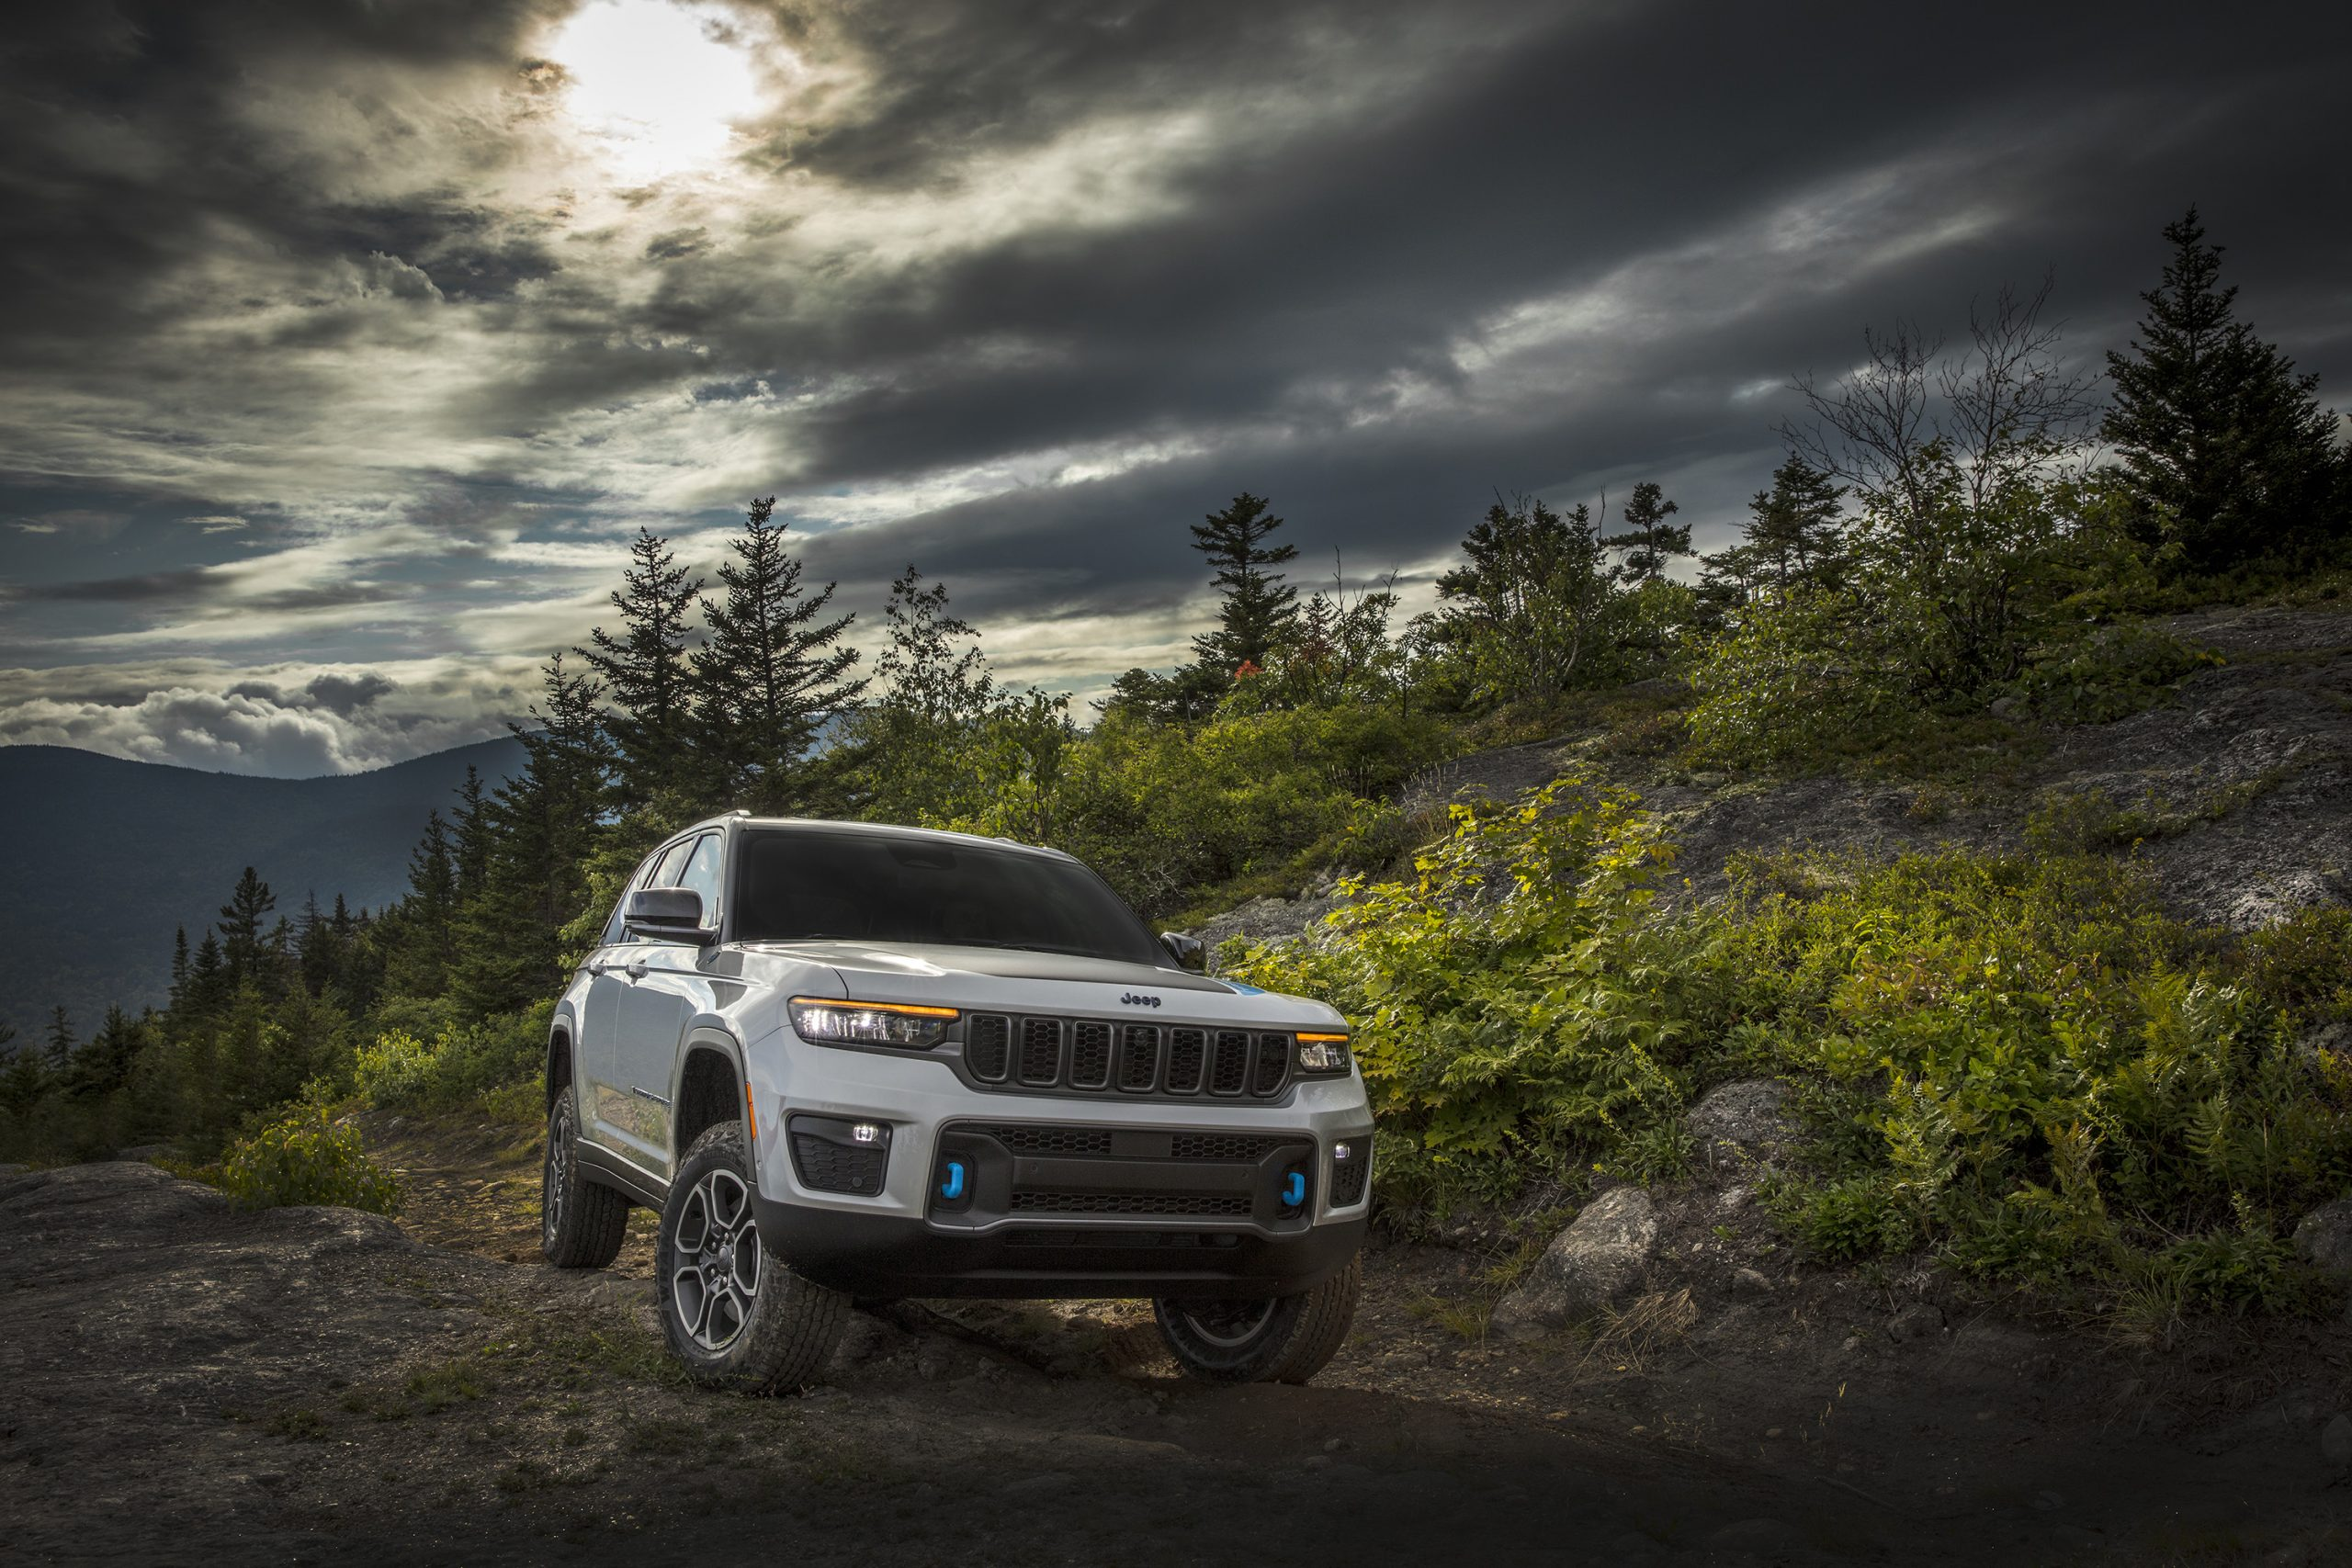 2022 Jeep Grand Cherokee Trailhawk 4xe on mountain roads